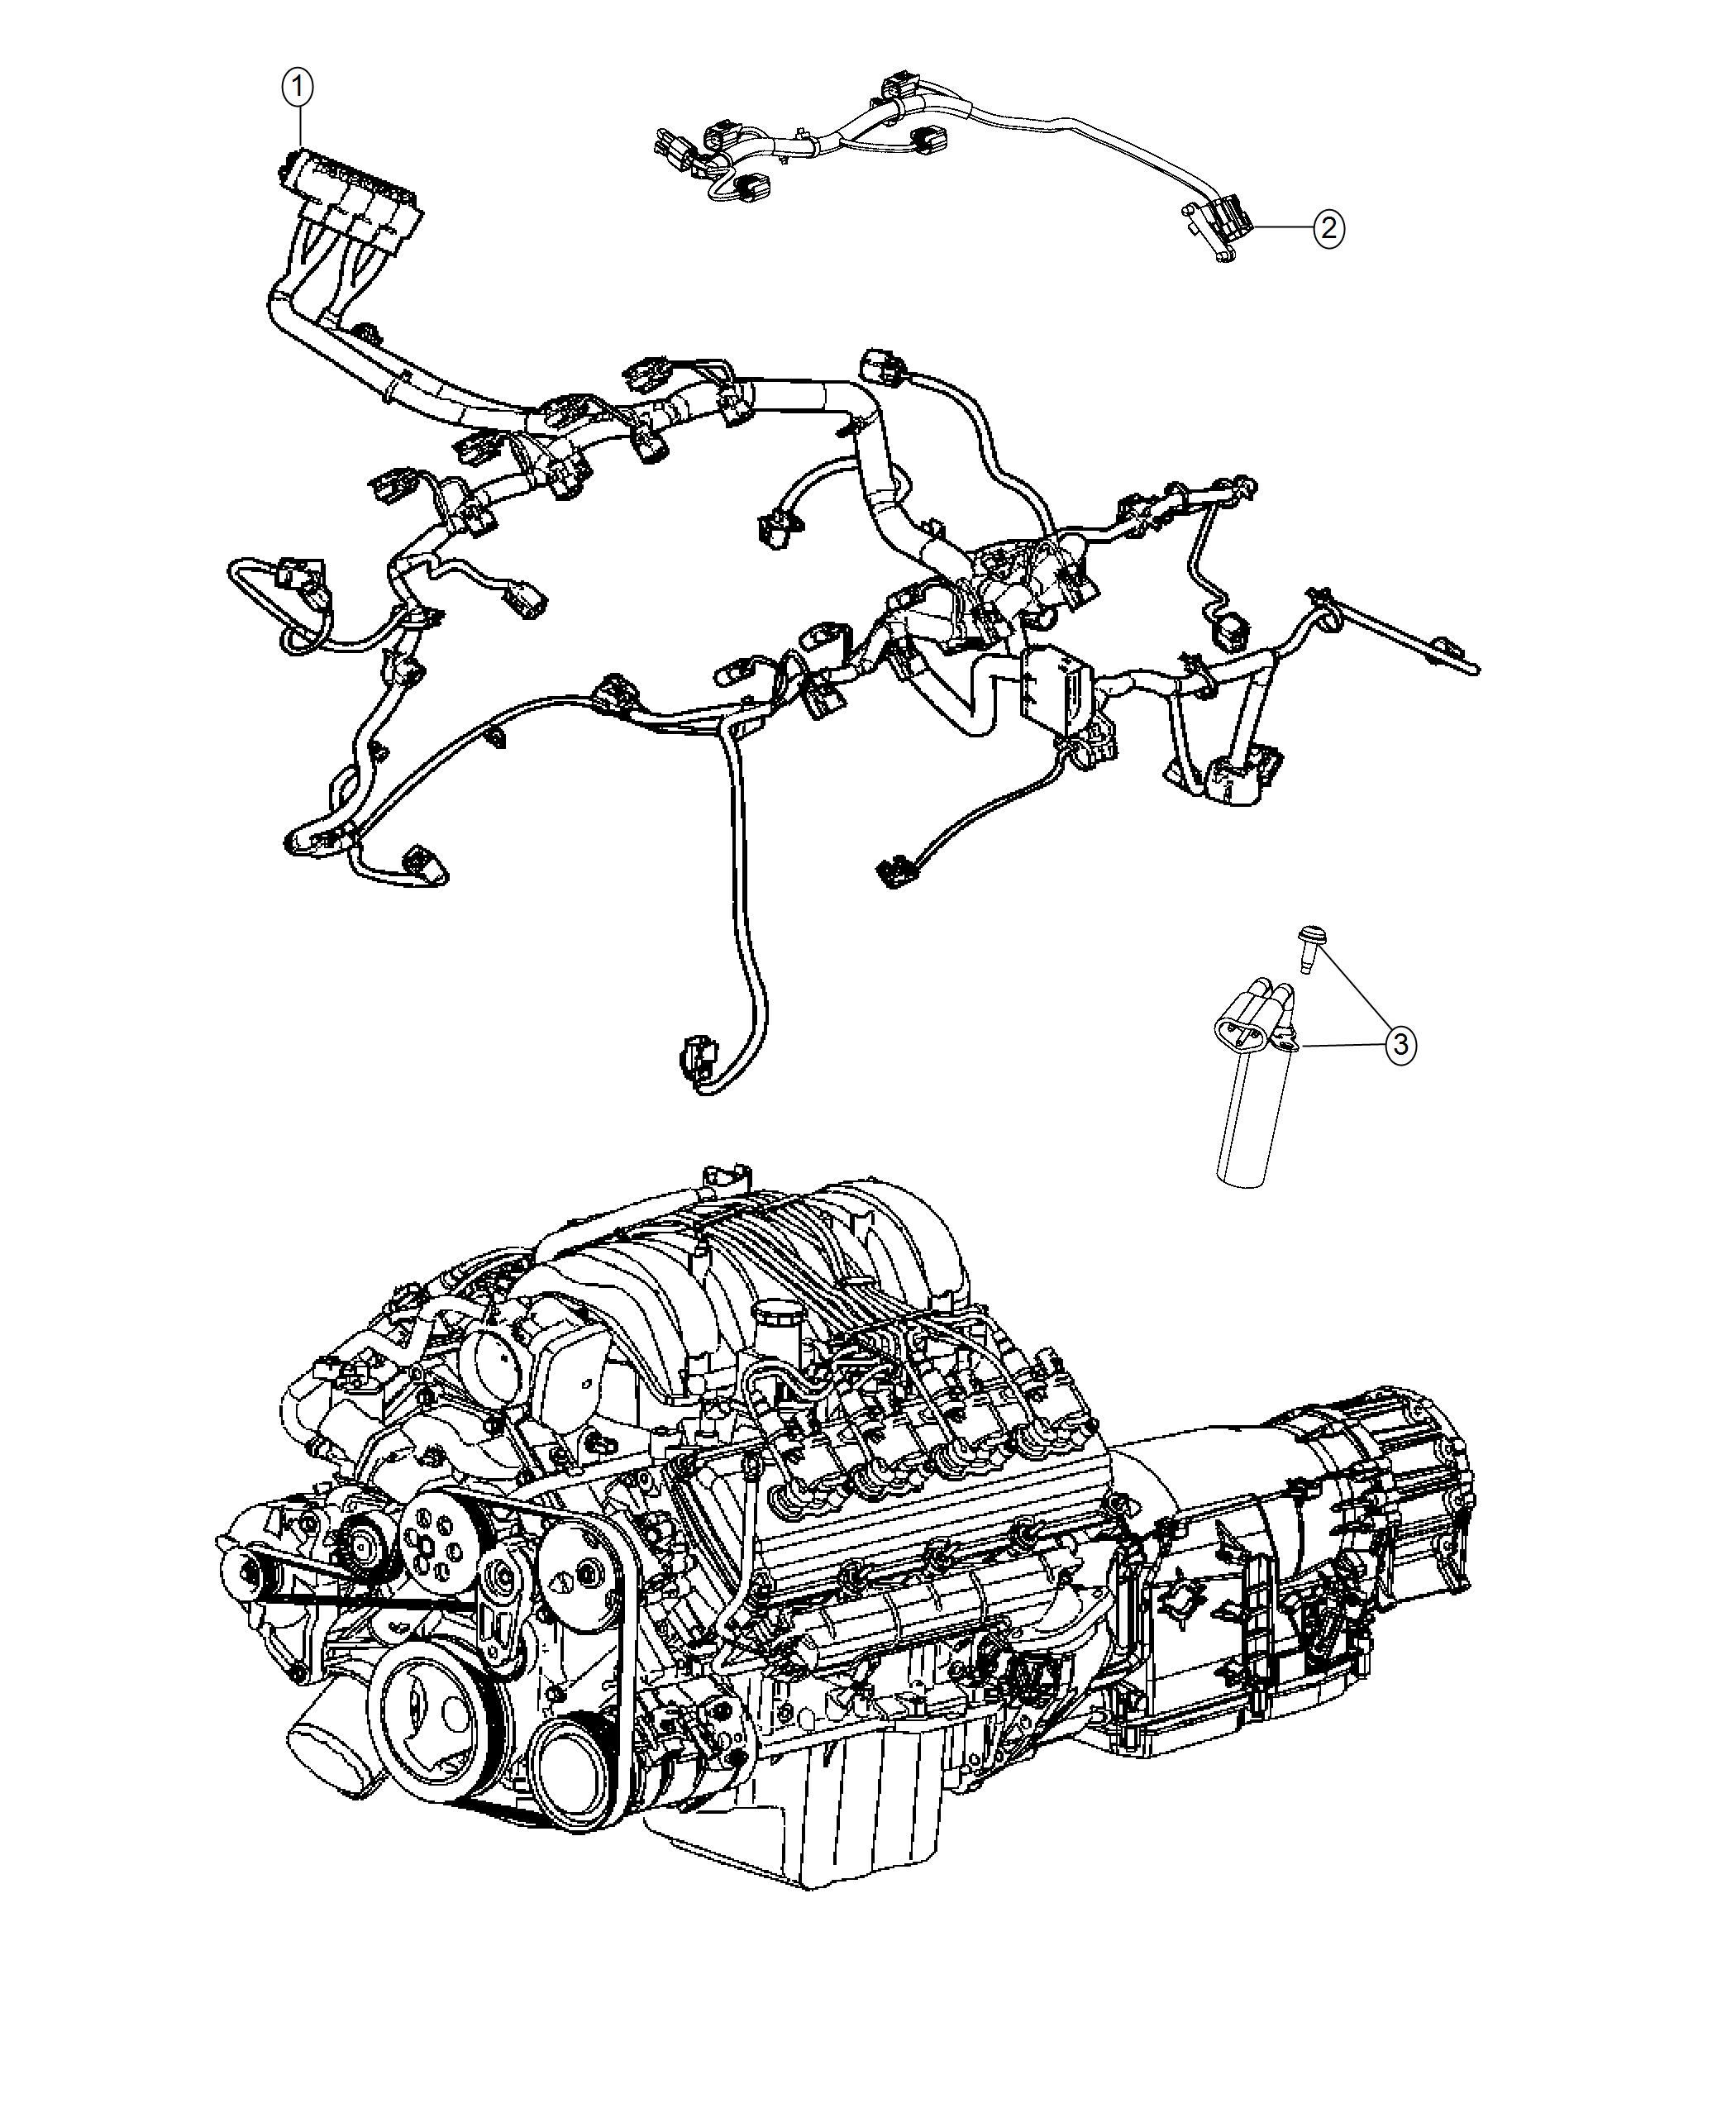 Jeep Grand Cherokee Wiring Engine Powertrain Heater